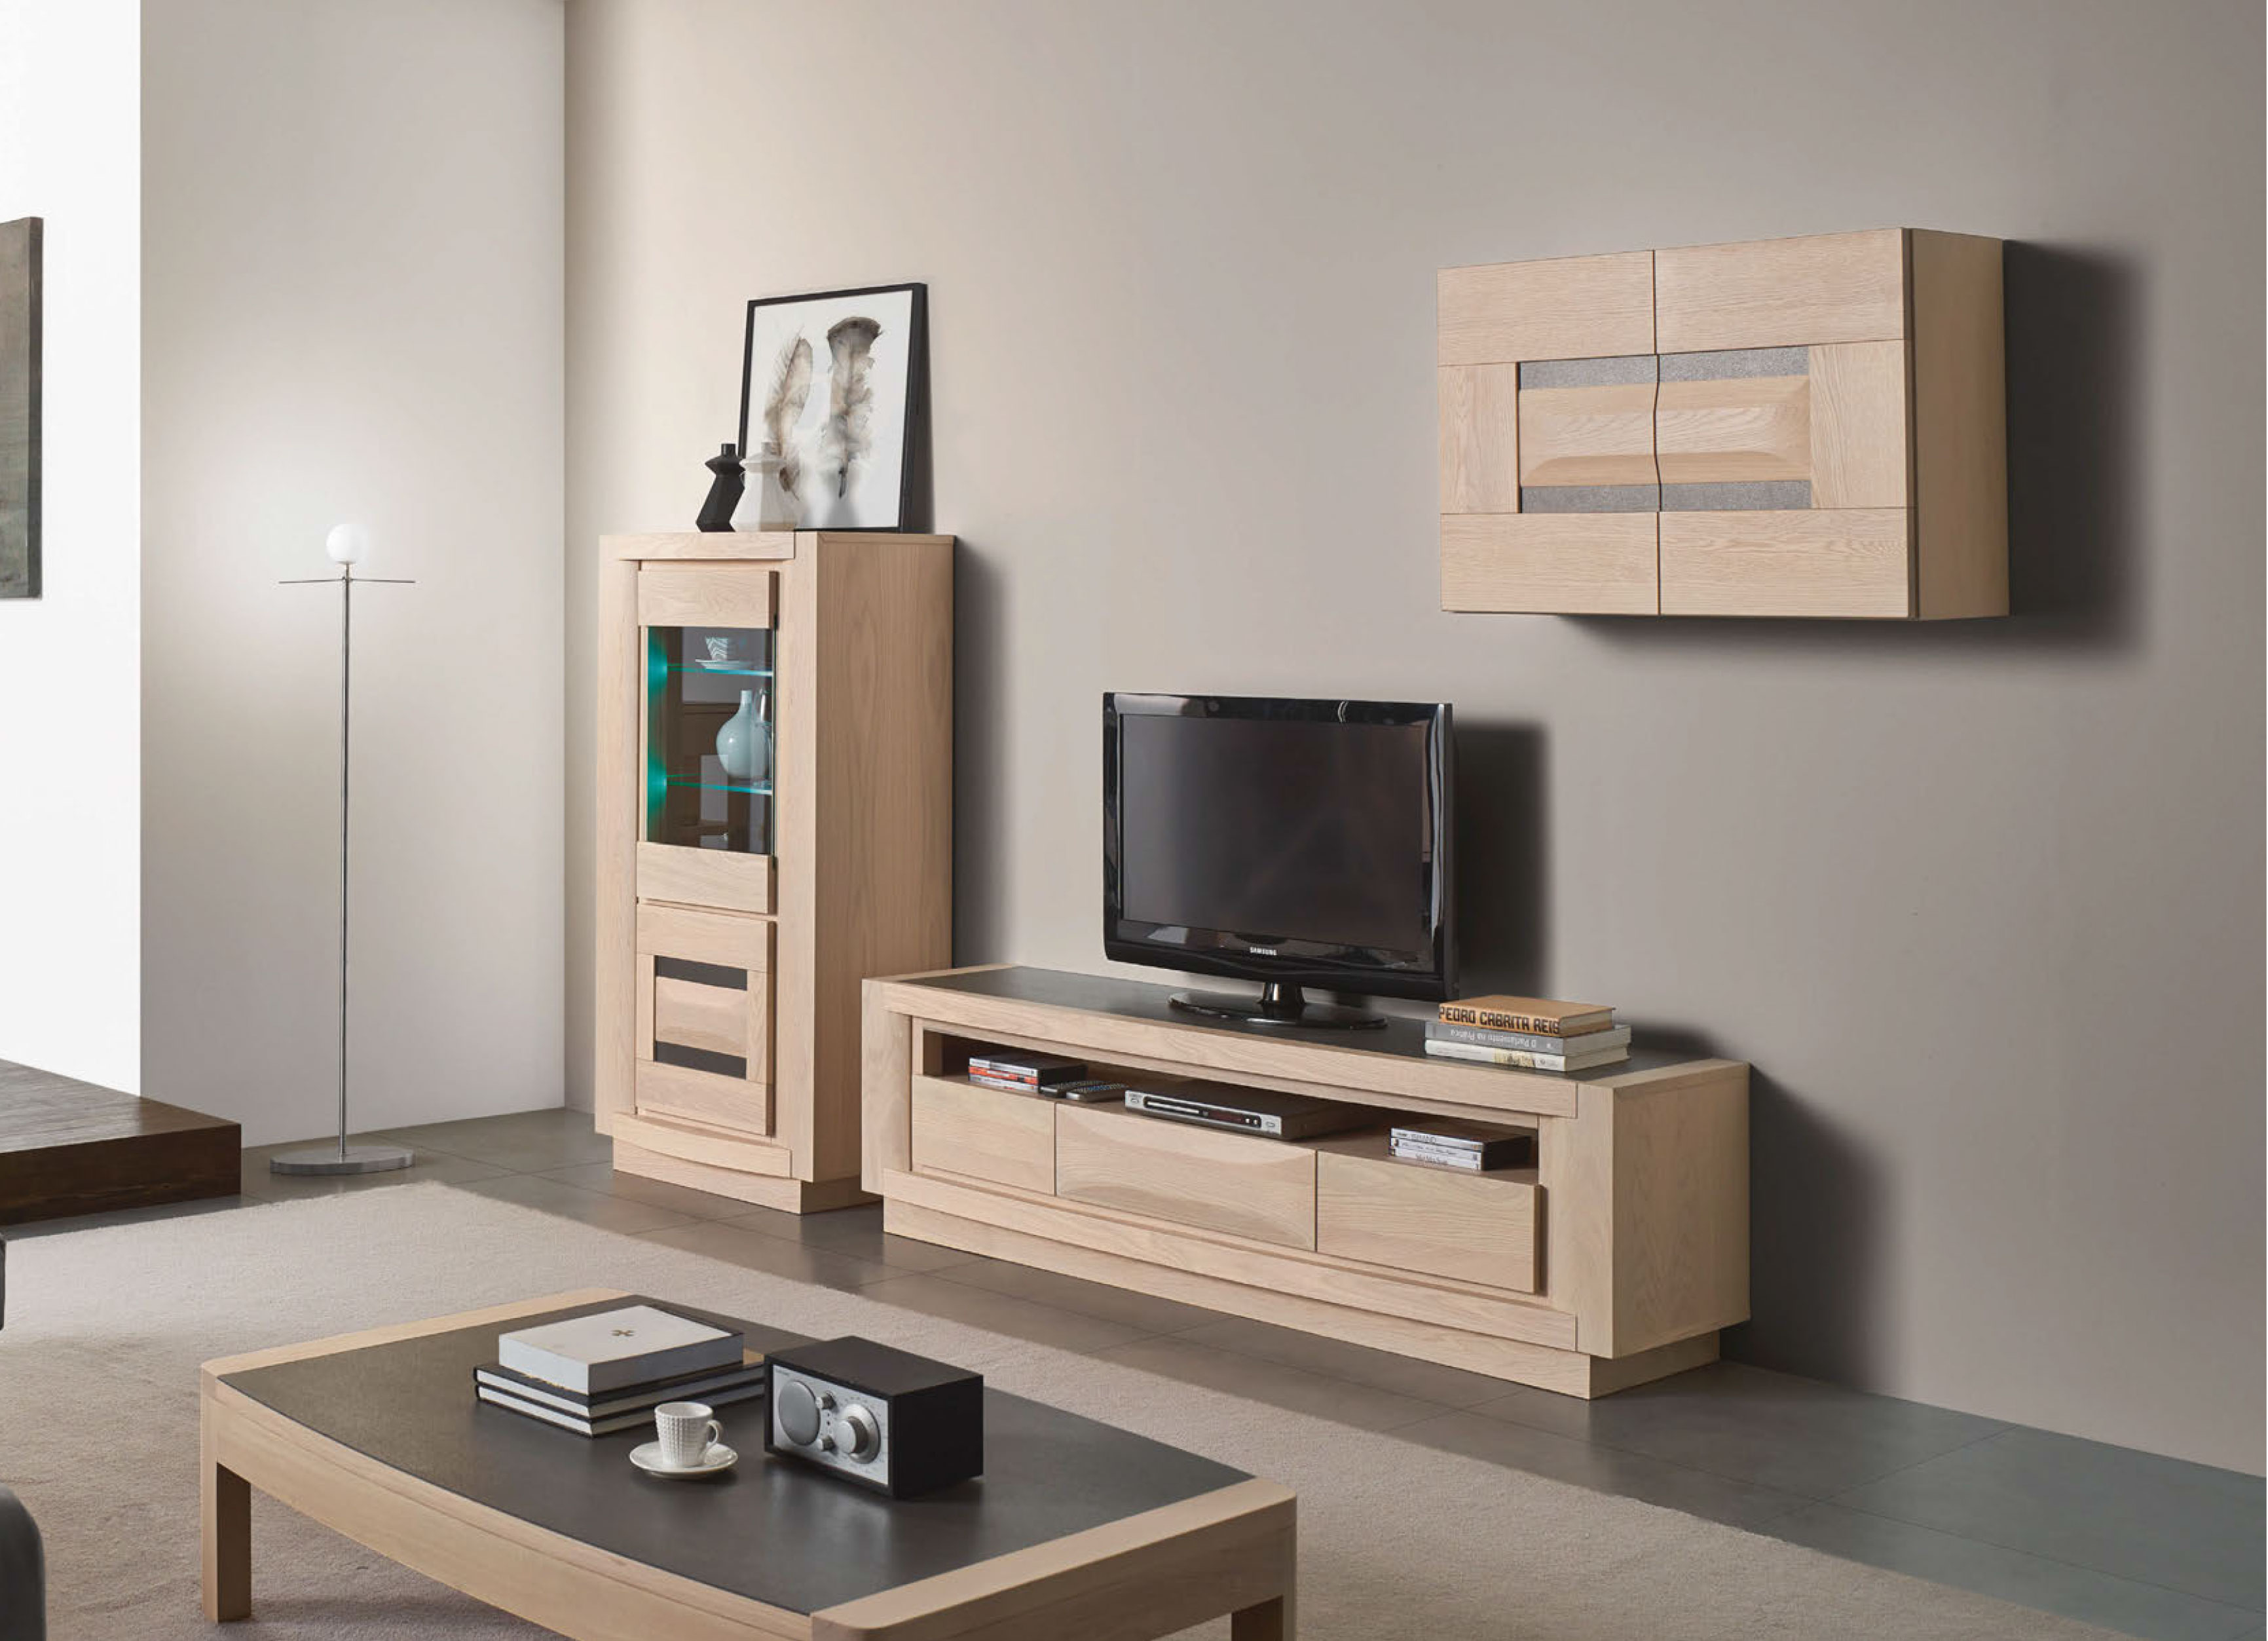 nouvelle salle manger marina de cacio. Black Bedroom Furniture Sets. Home Design Ideas